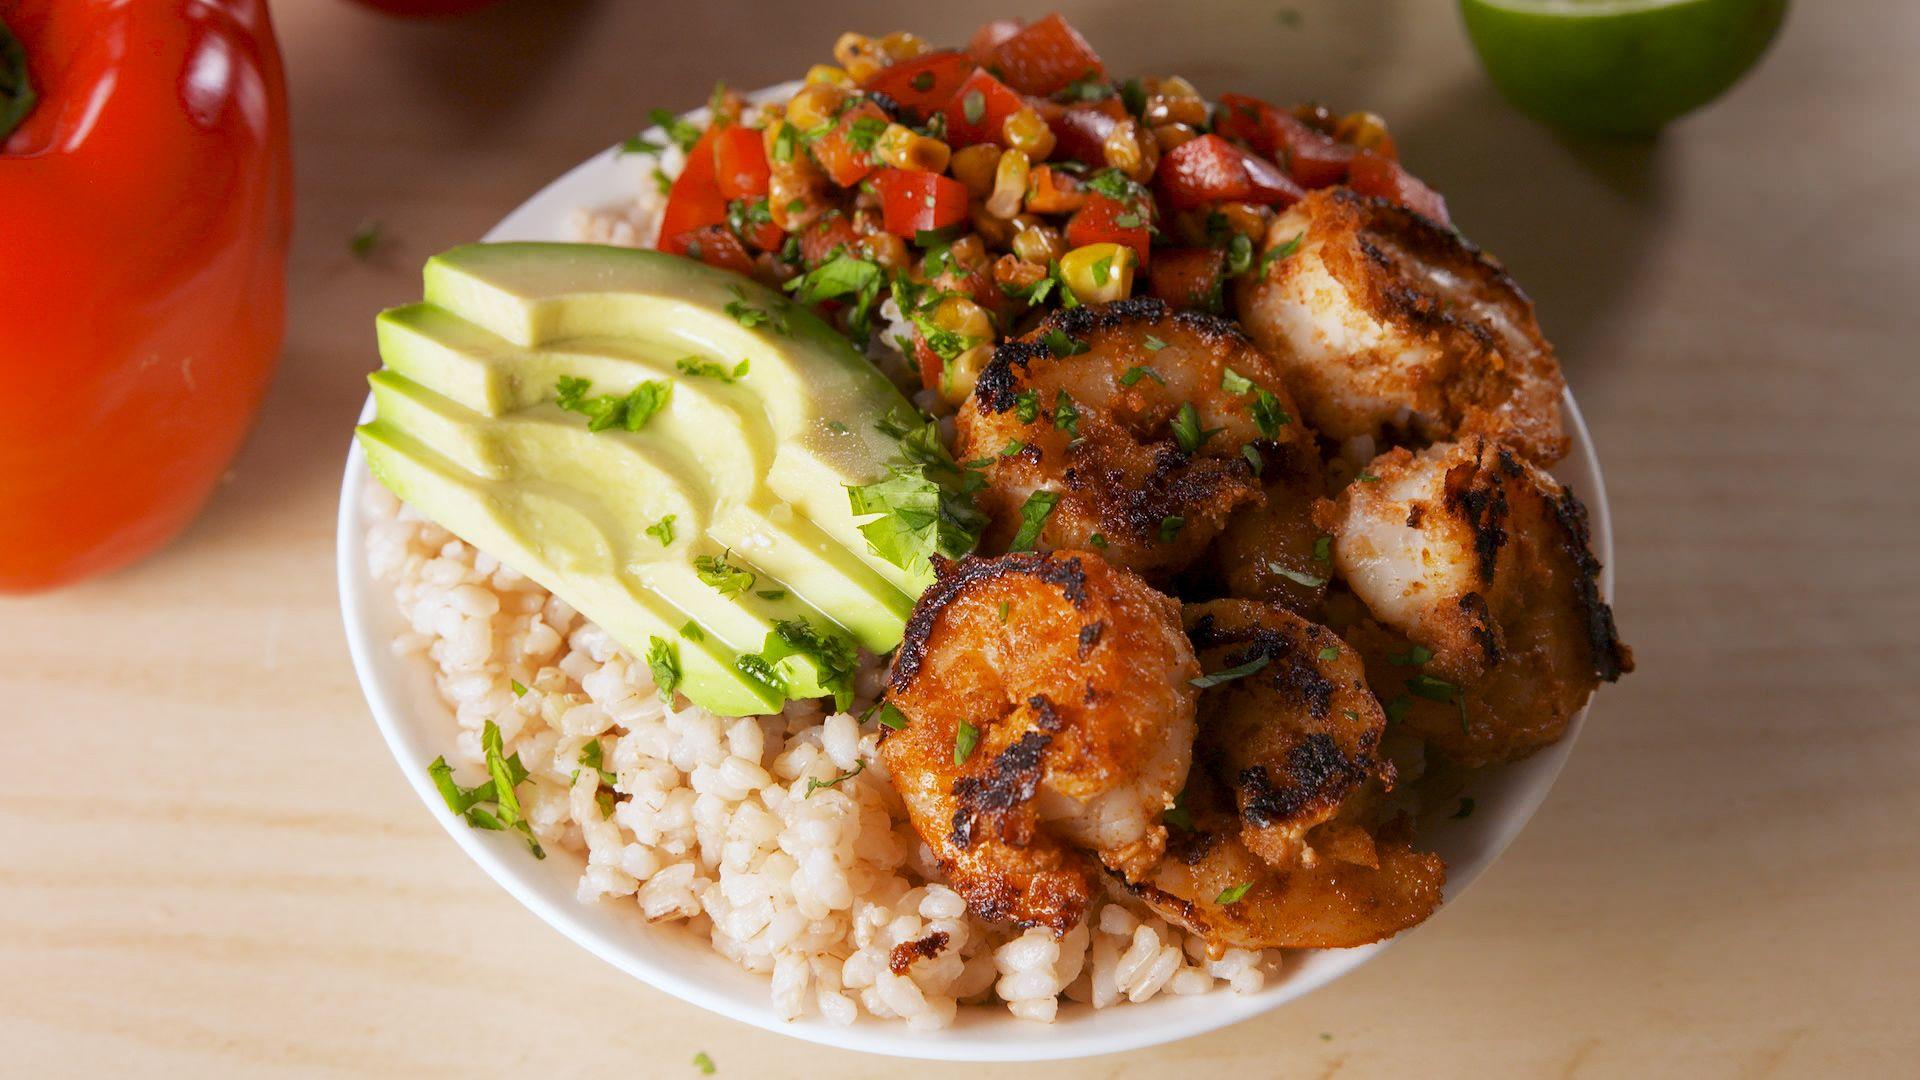 best blackened shrimp bowls recipe how to make blackened shrimp bowls